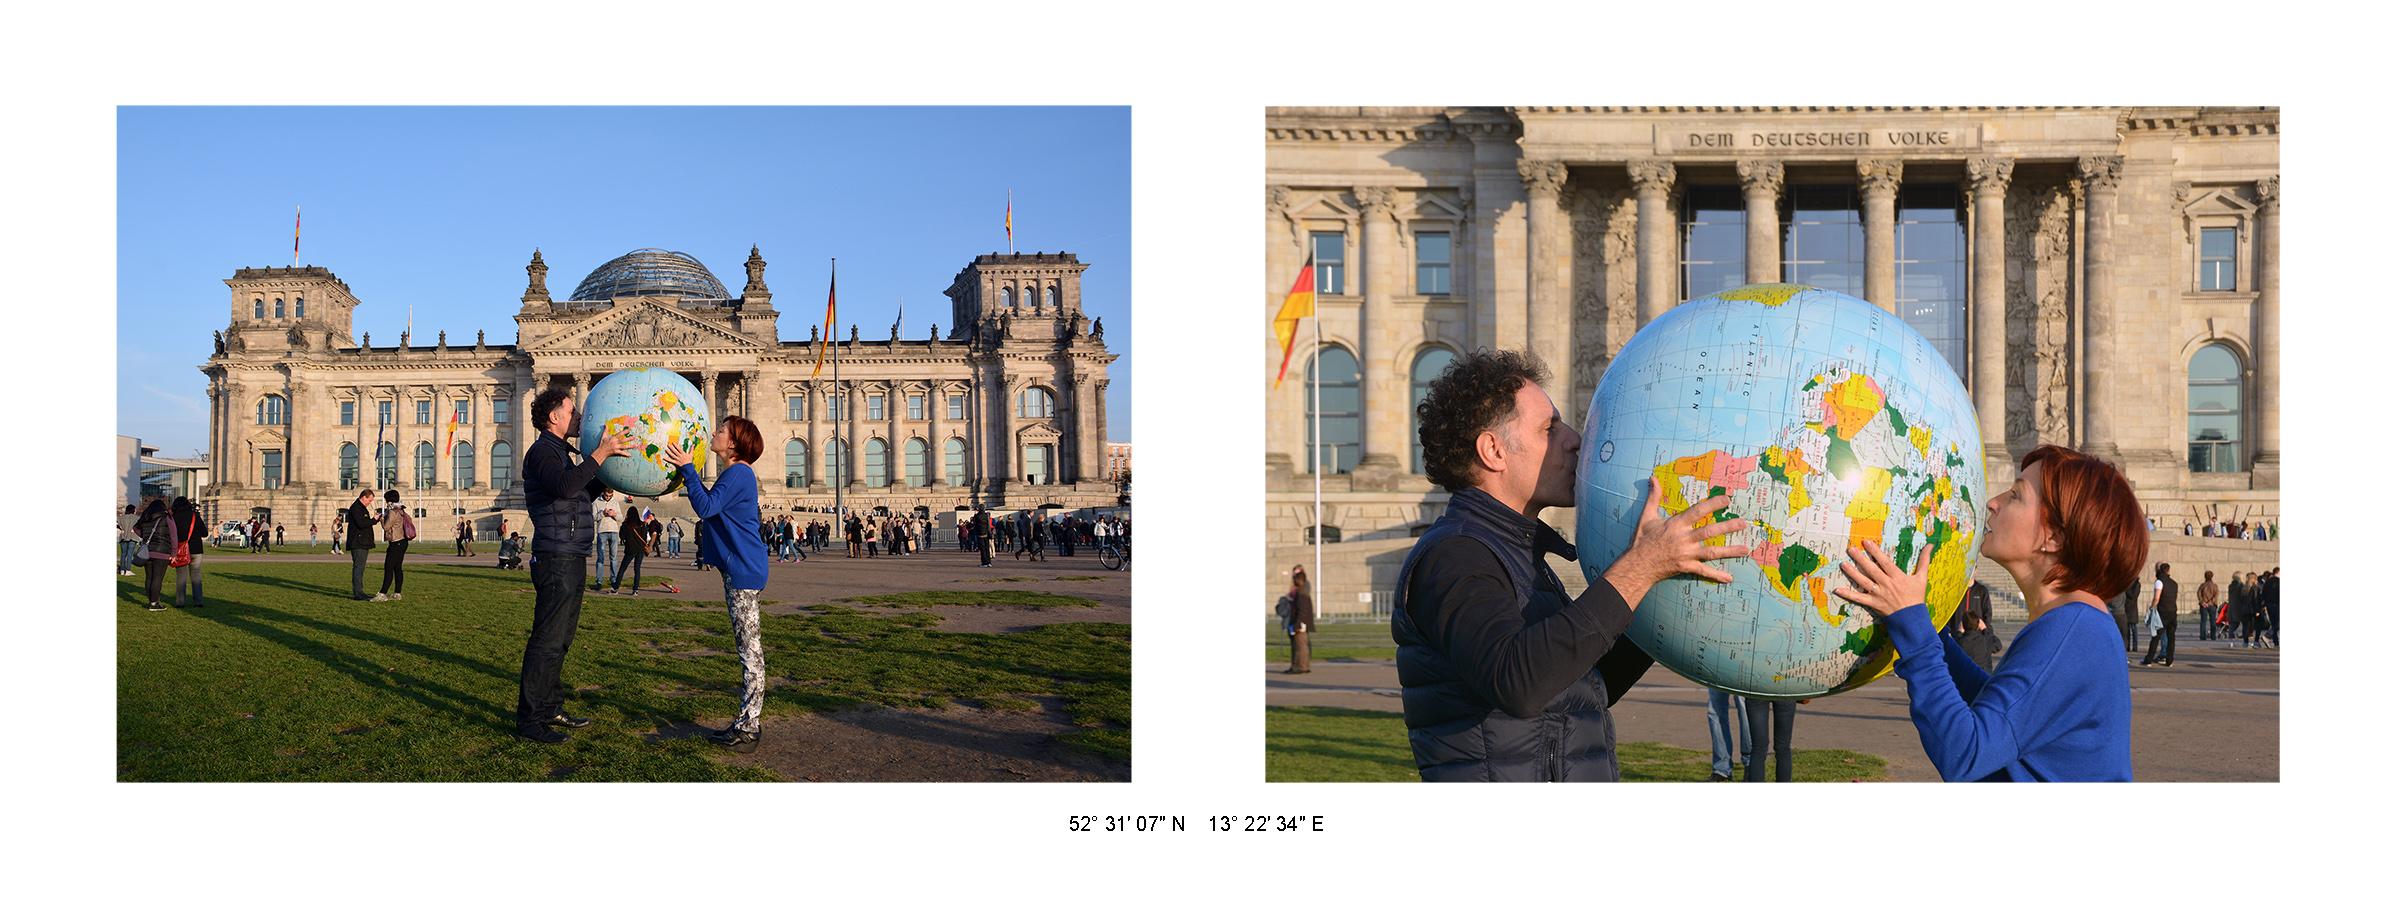 Berlin (Palais du Reichstag) - 2014